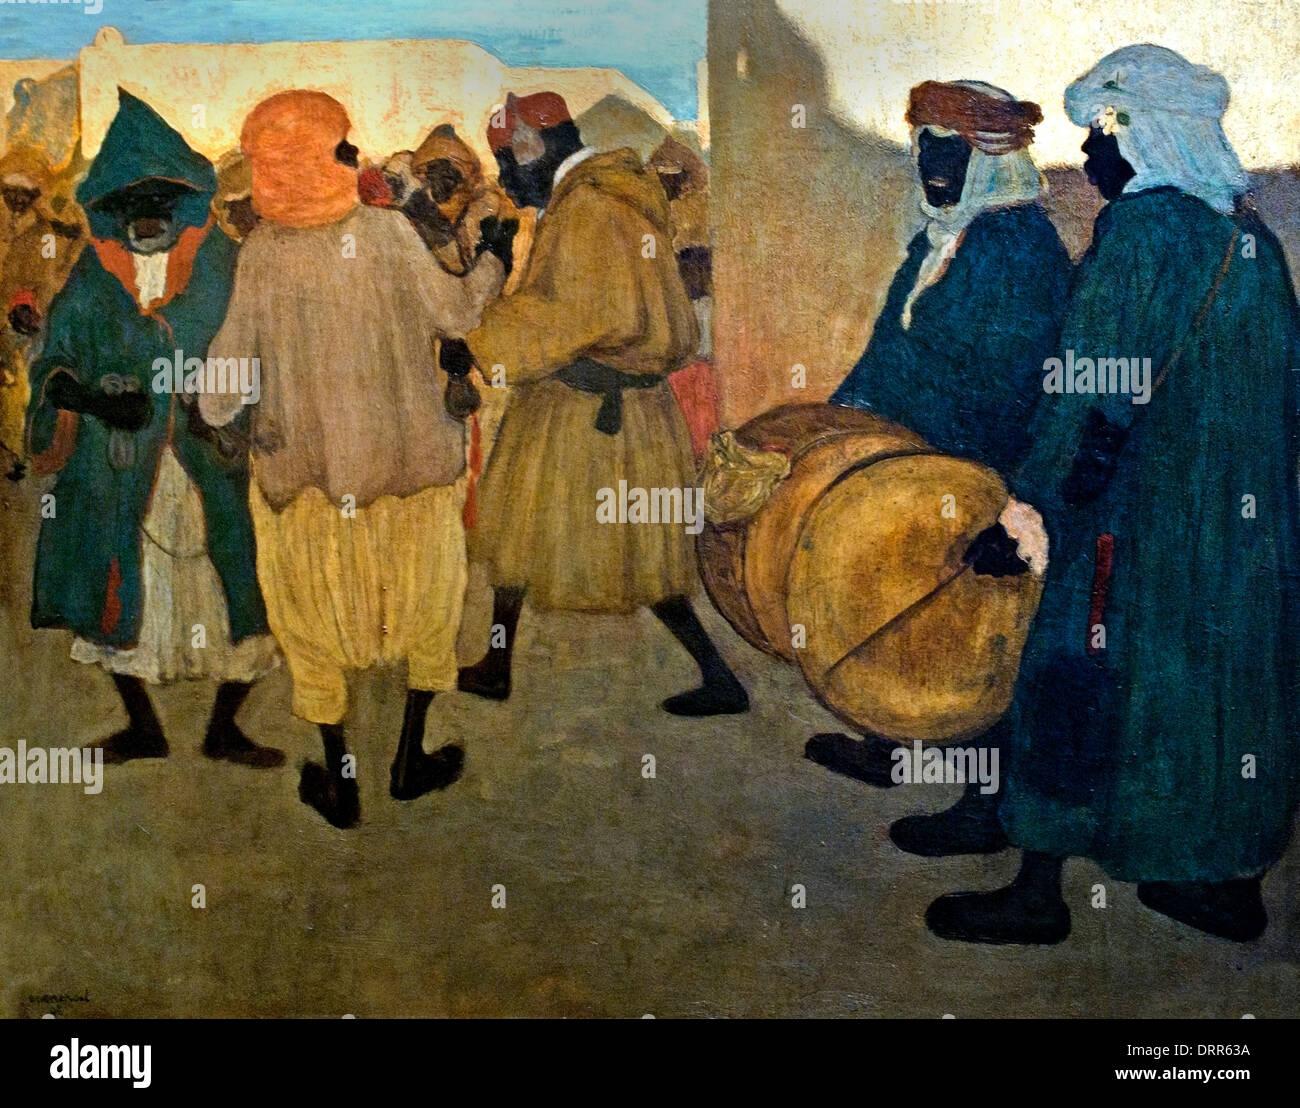 Annuncio del Festival negro Blida Algeria Henri Evenepoel (1872-1899) Blidah 1898 Belgio belga Immagini Stock